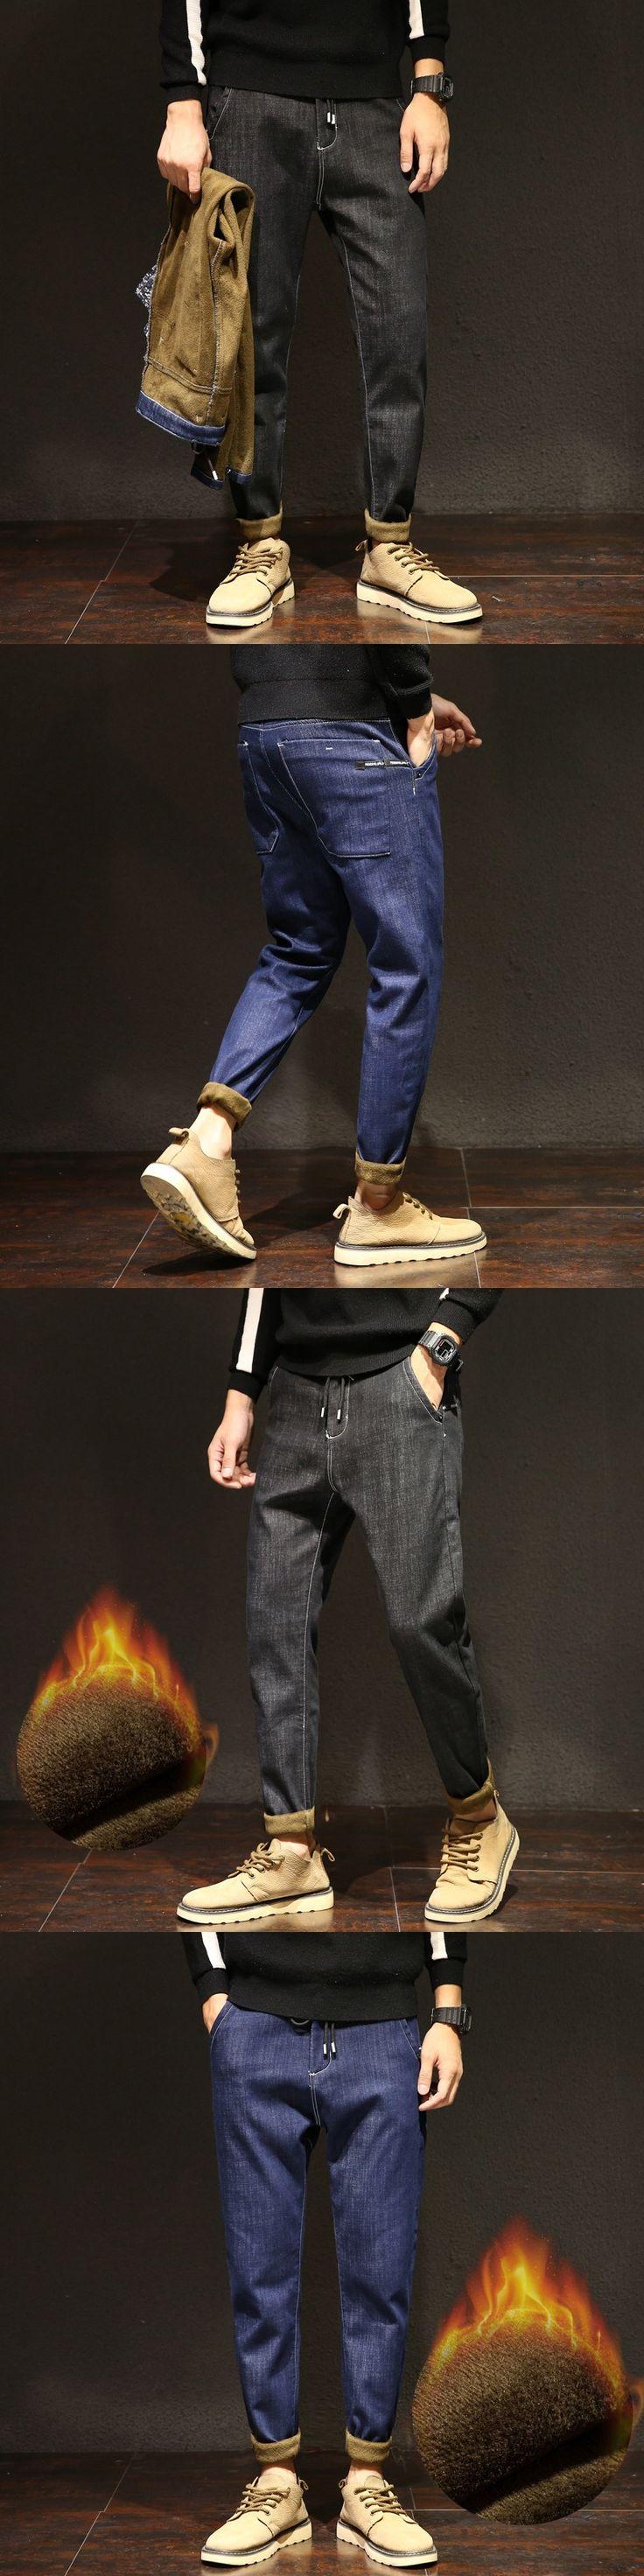 Winter Mens Stretch Jeans Warm Fleece Flannel Lined Quality Denim Jean Pants Size 28-38 Brand Black Jeans for Mens